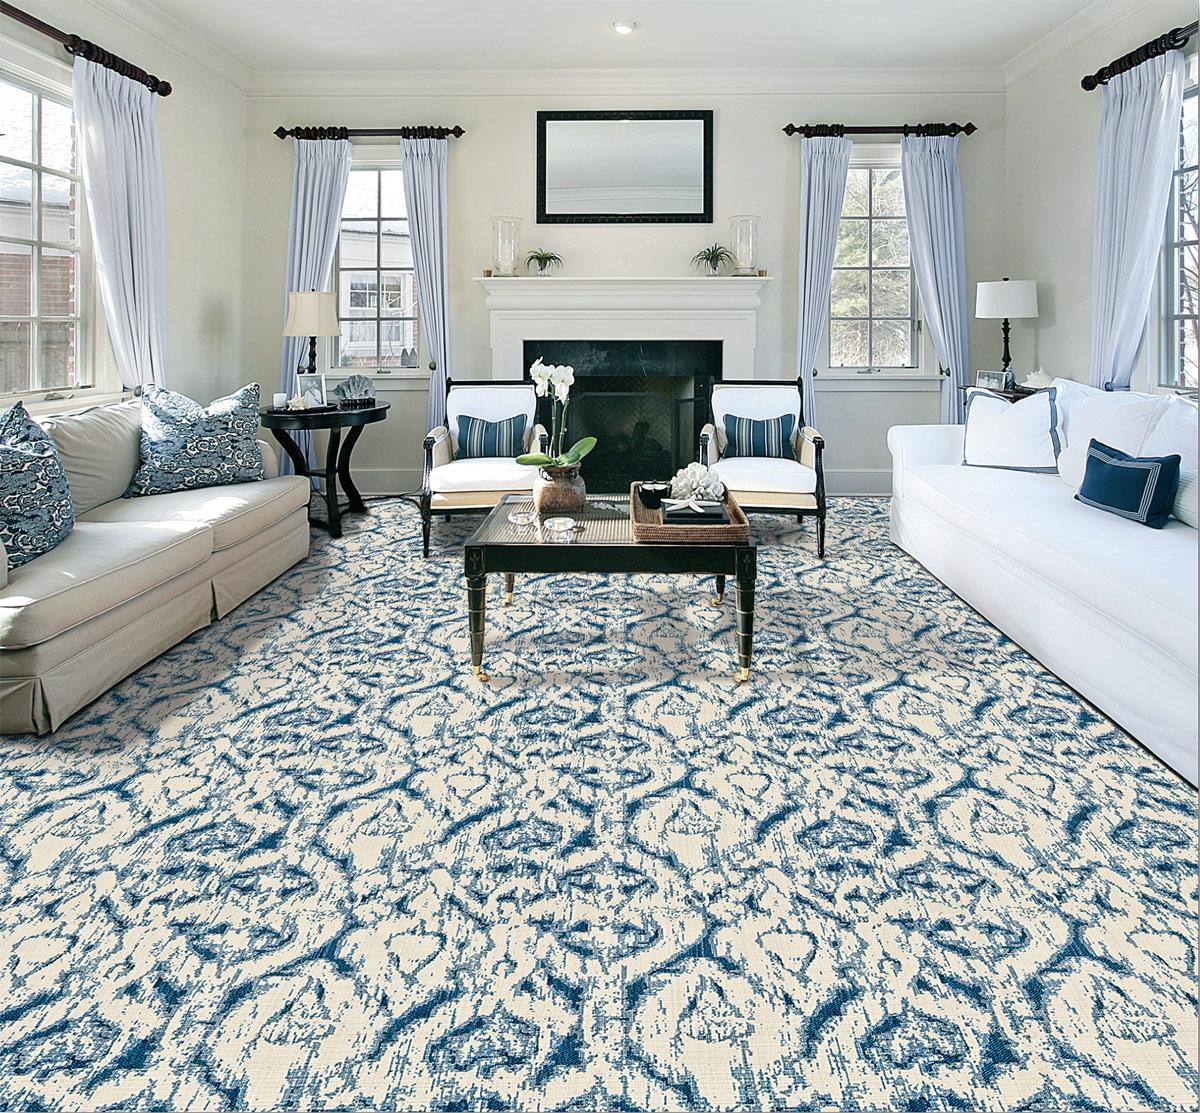 livingroom:living room carpet decorating ideas amusing best colour for blue  morroccan pattern MHSPEXU